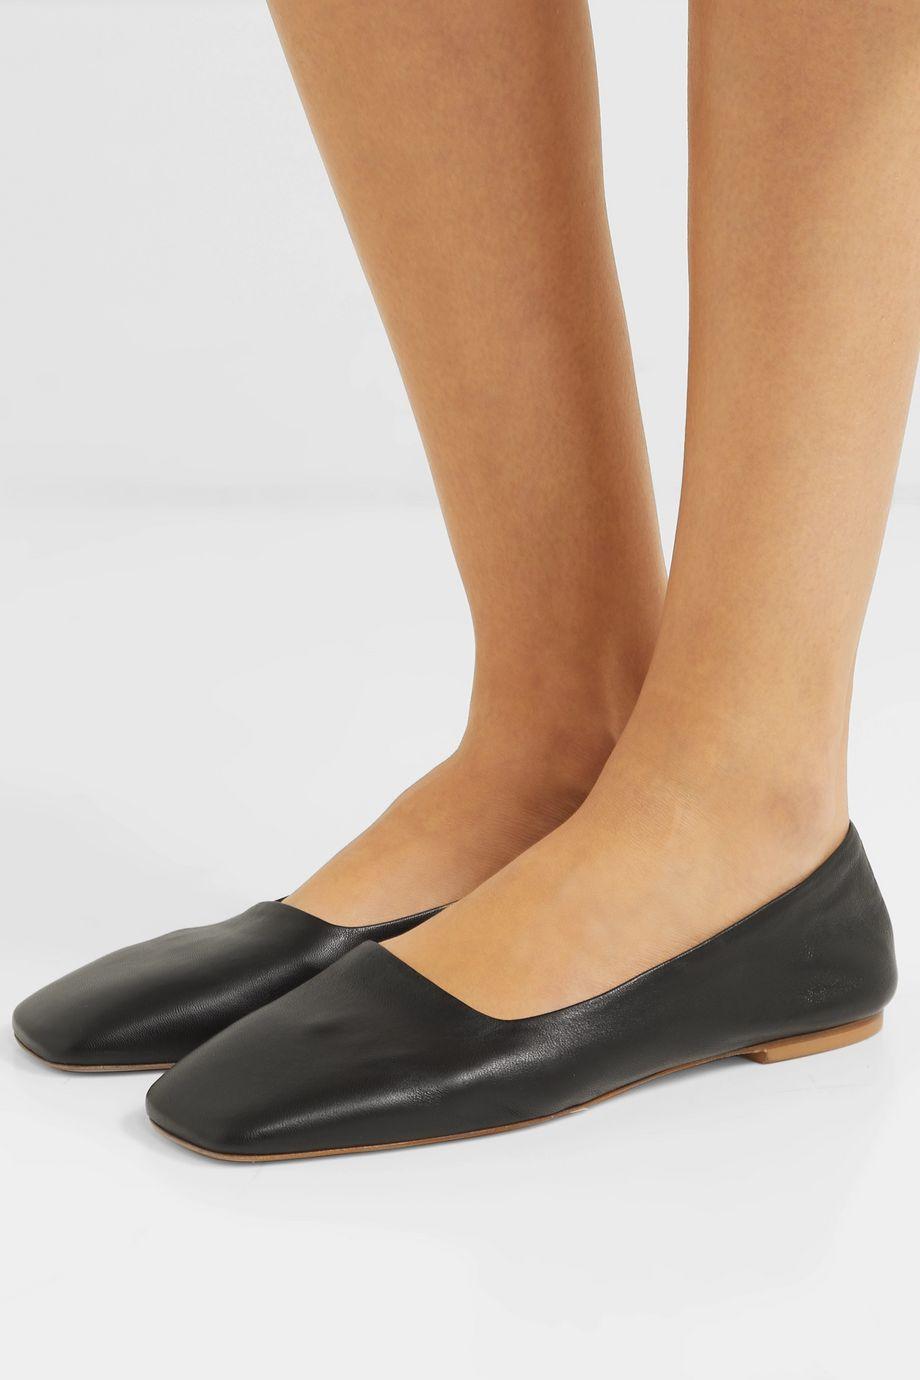 aeydē Beau leather ballet flats